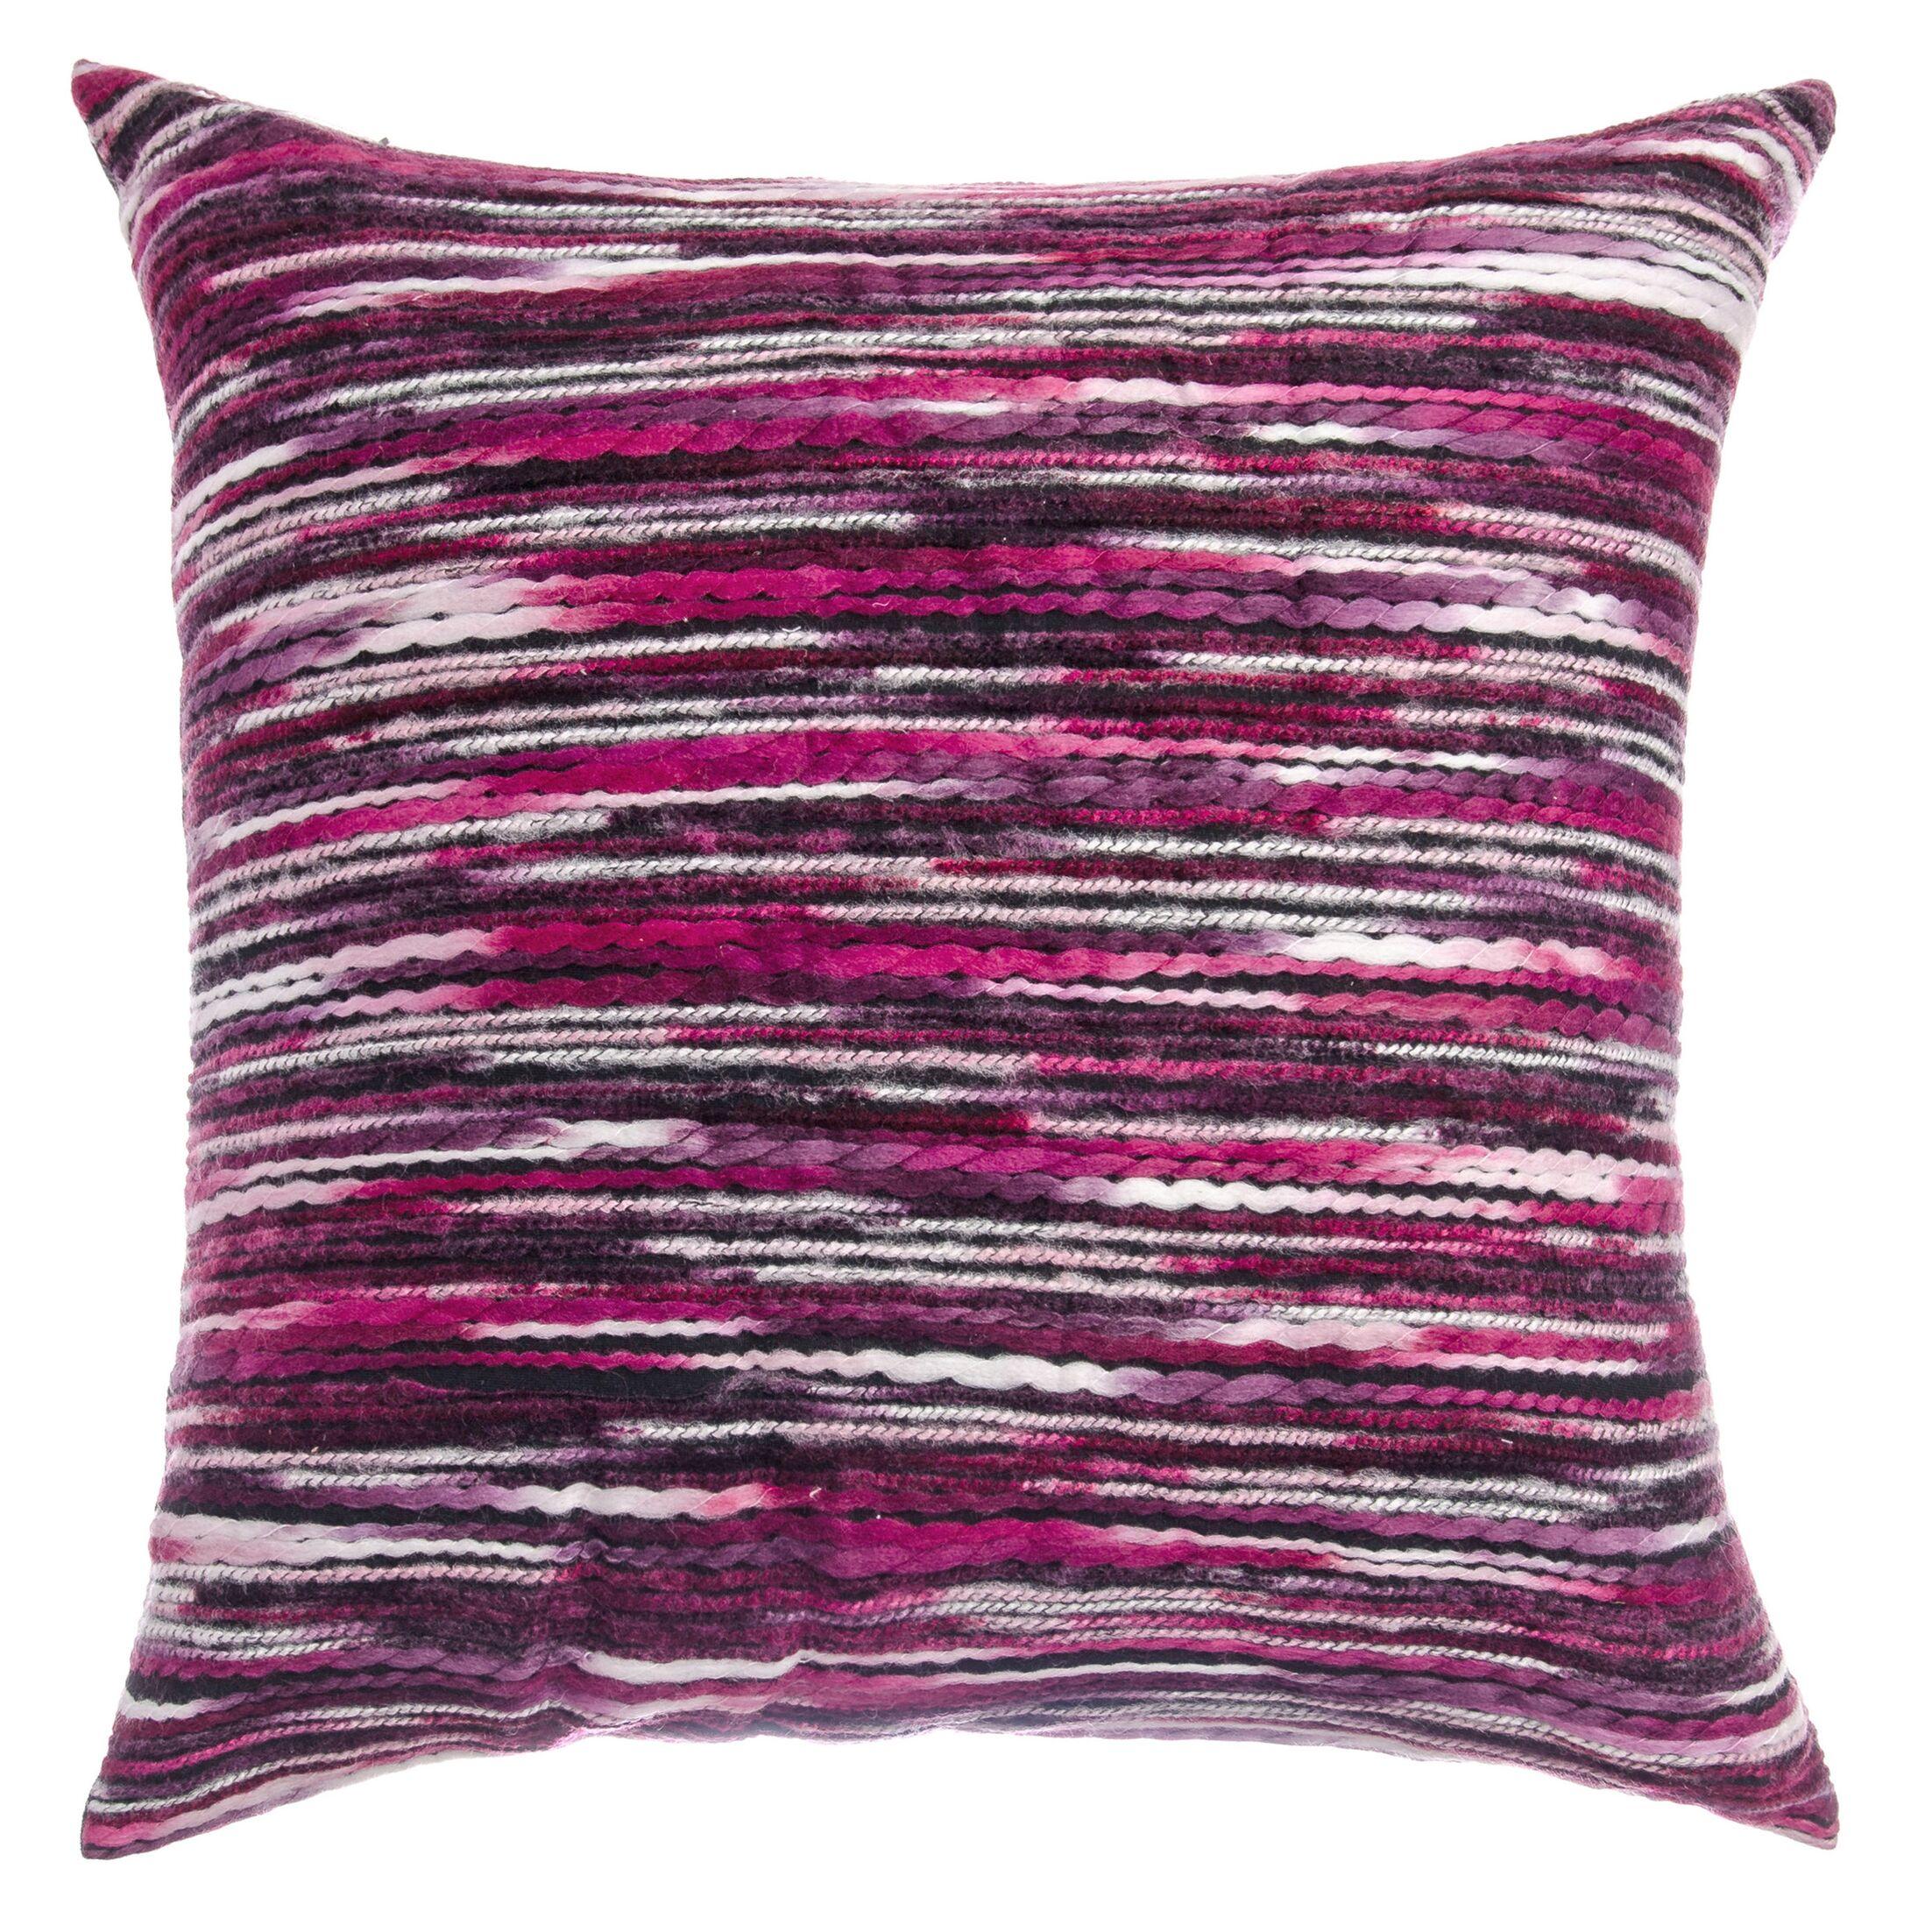 Dirkes Decorative Throw Pillow